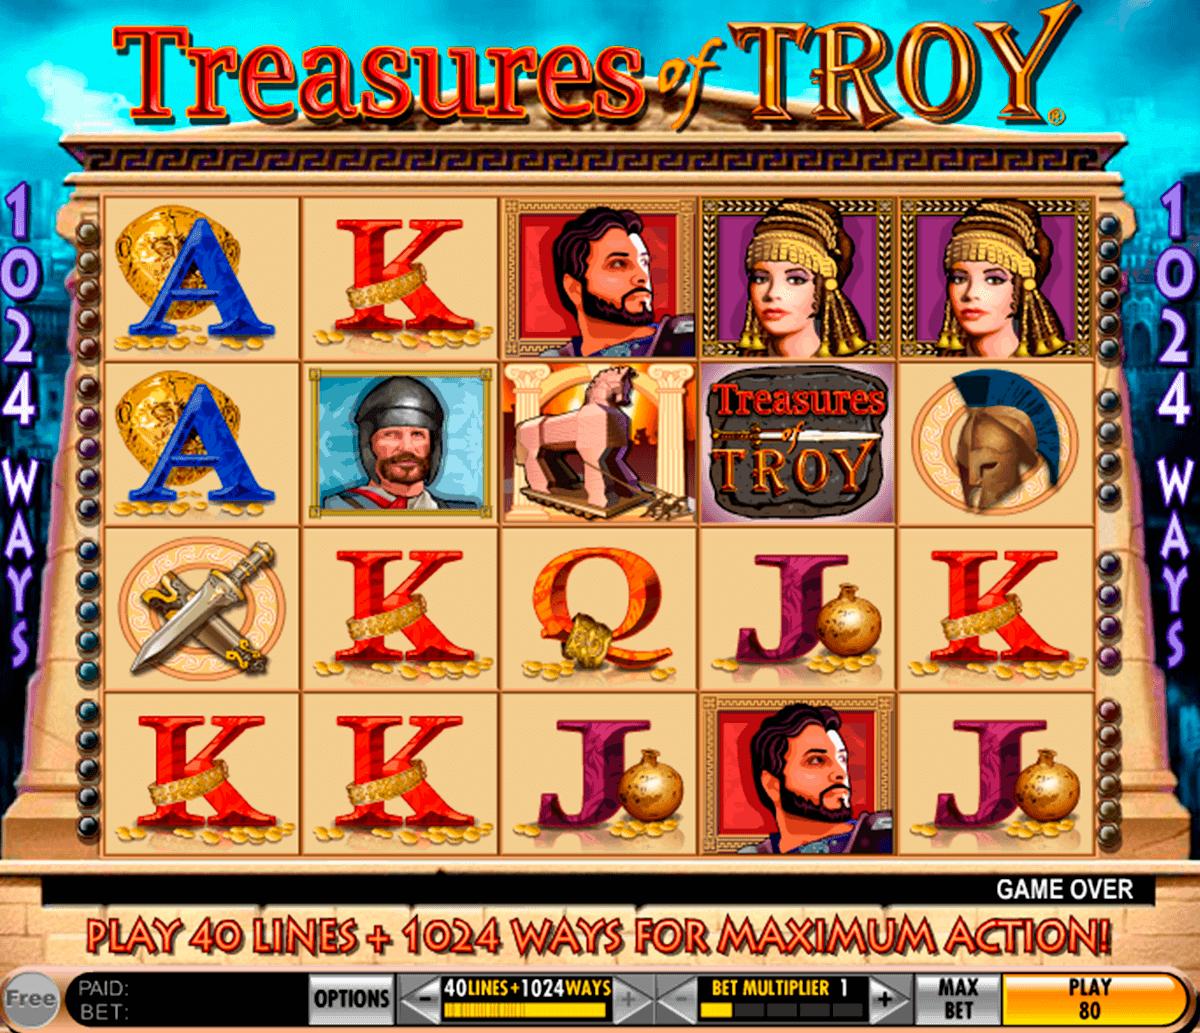 Treasures of troy slot machine online free